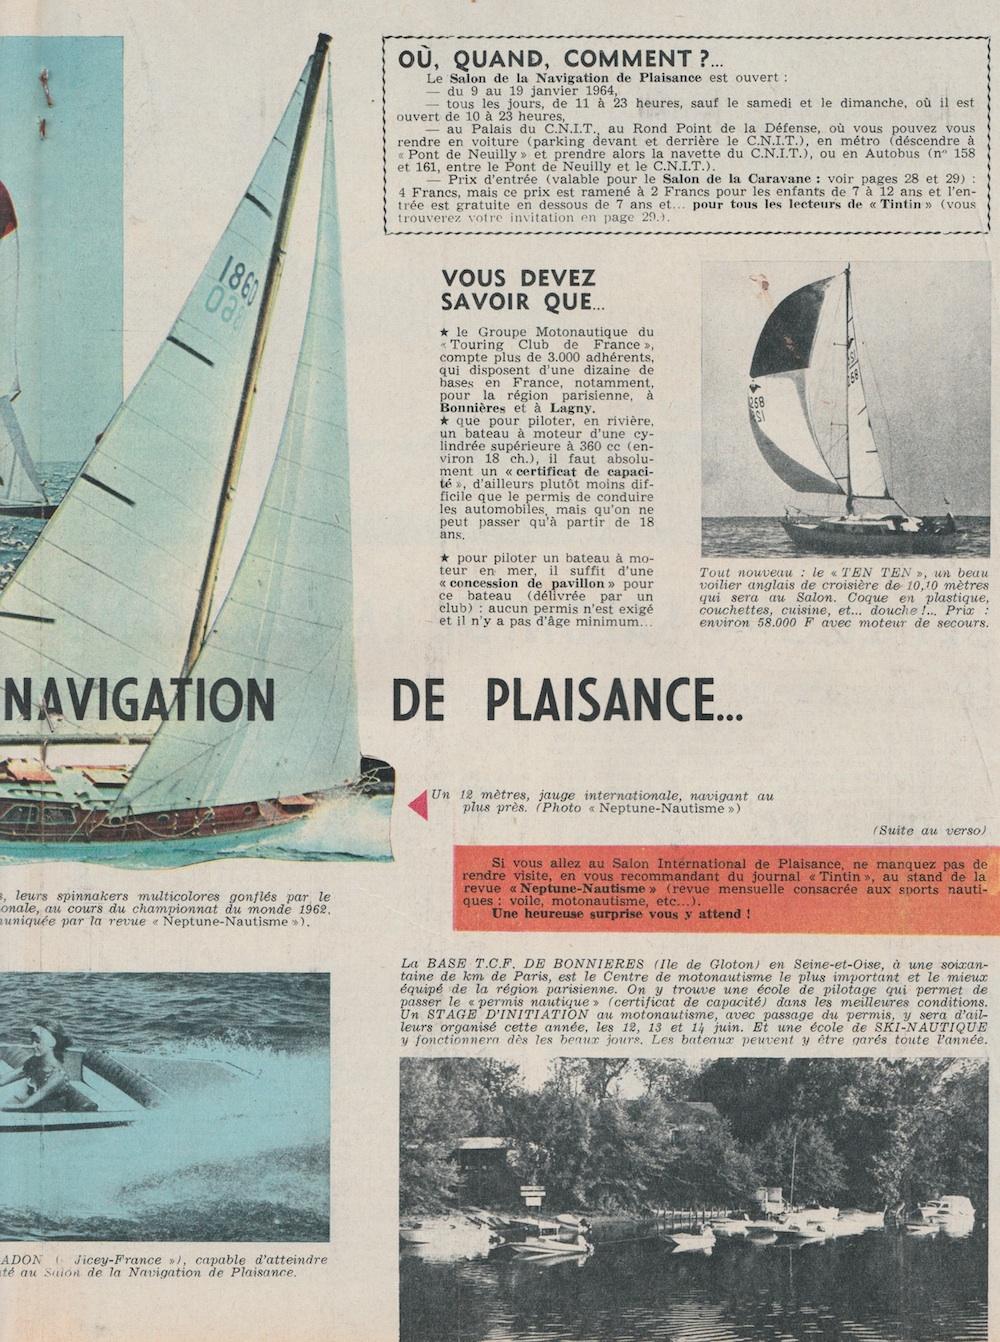 1605868621_tintinn_bateau.jpg